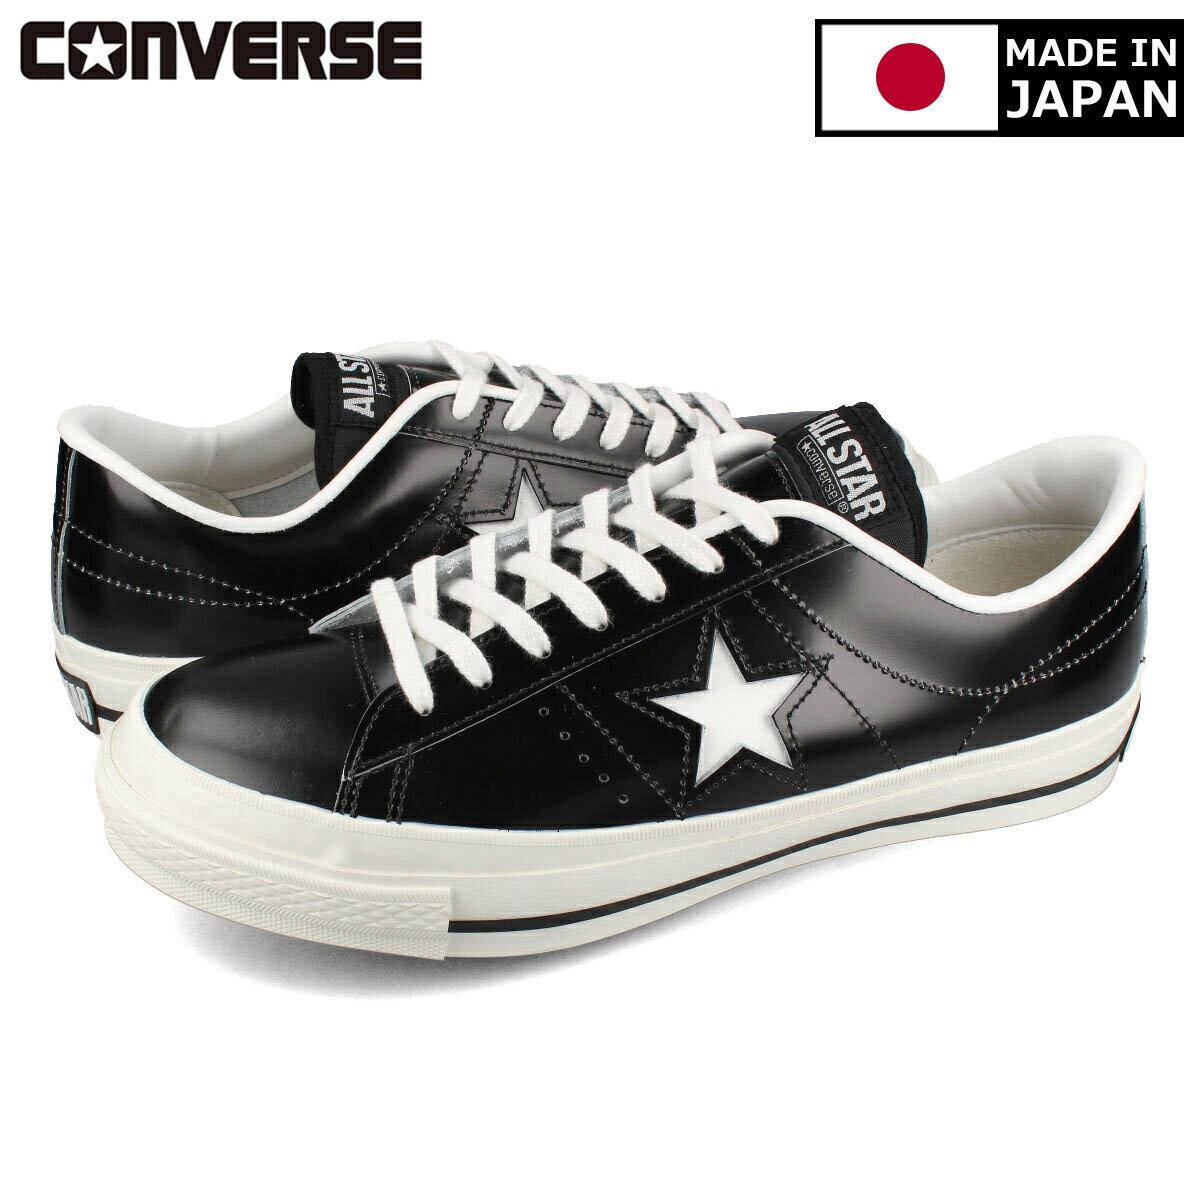 CONVERSE ONE STAR J 【MADE IN JAPAN】【日本製】【メンズ】【レディース】コンバース ワンスター J BLACK/WHITE